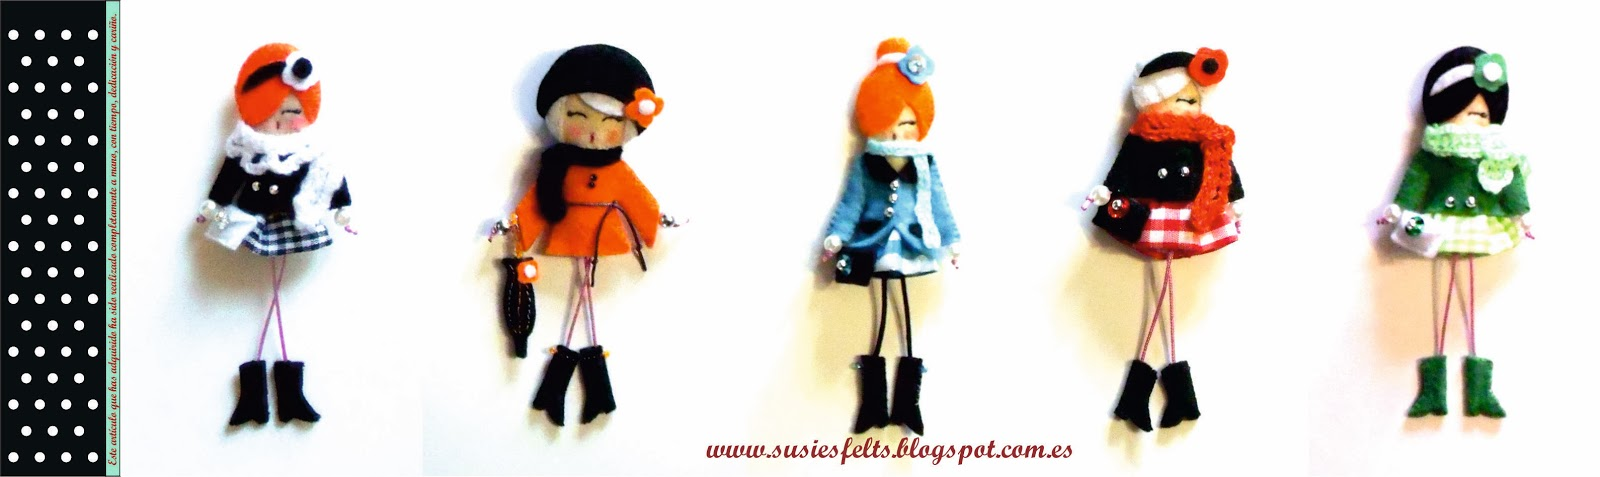 Susies, broches, fieltro, bufandas, muñecas, handmade